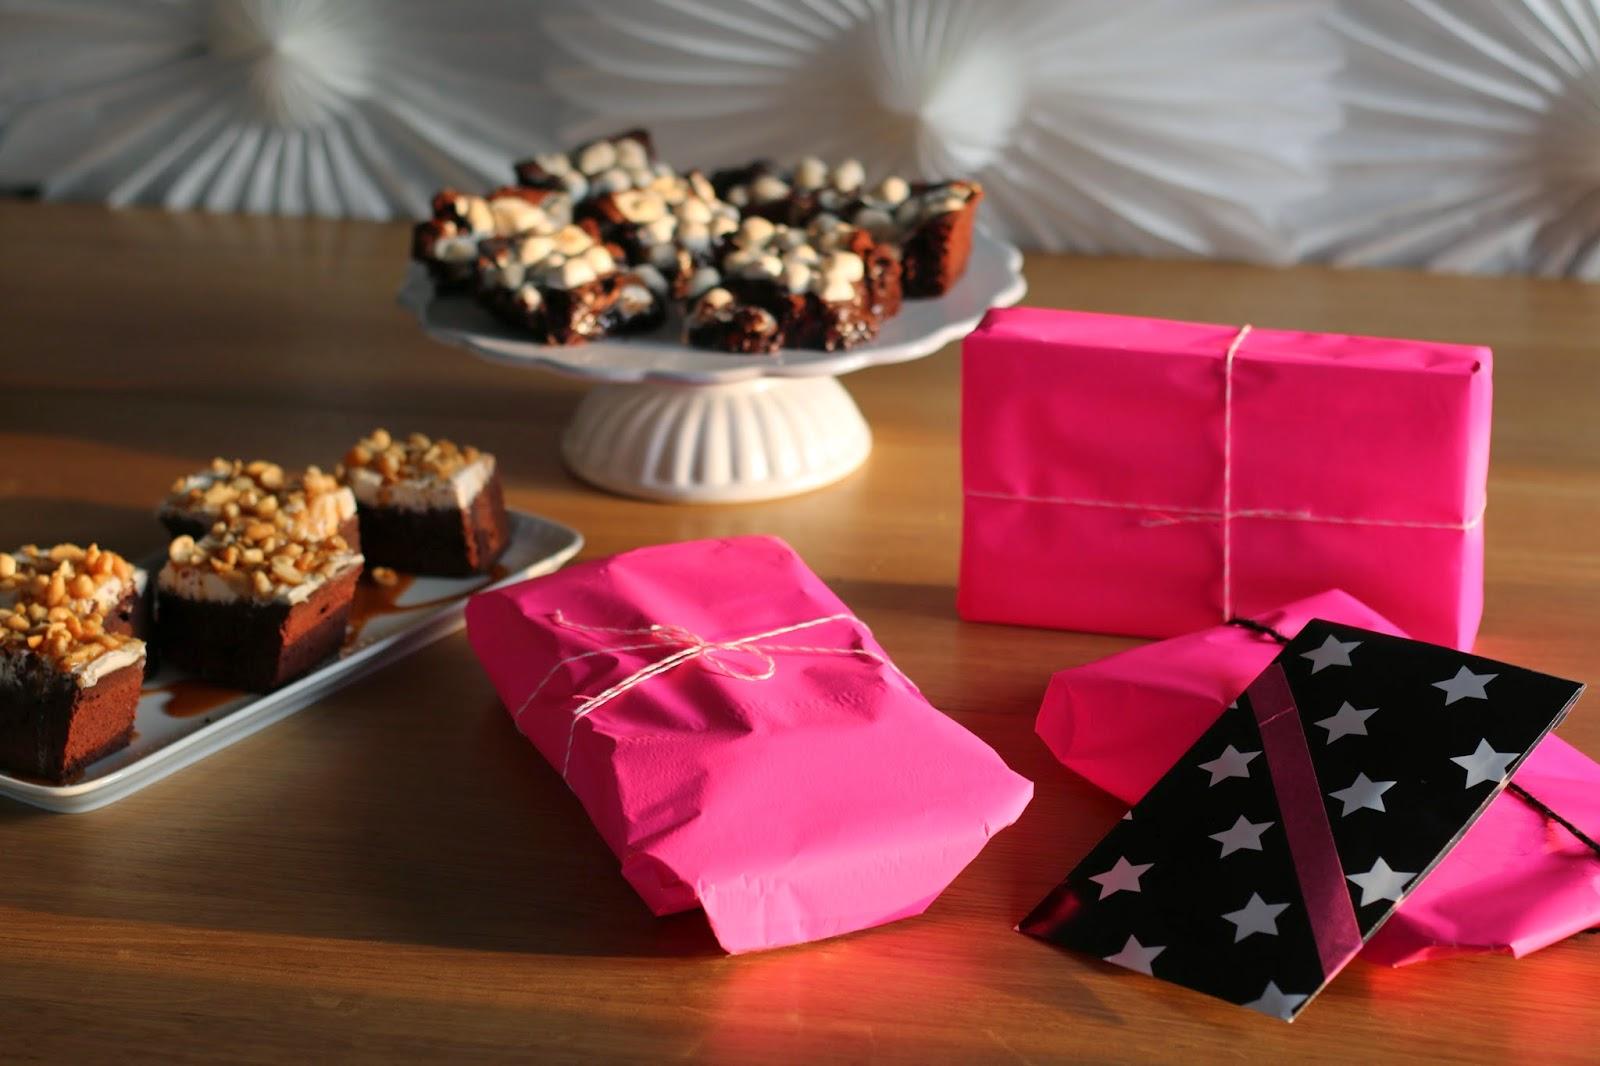 Brownies, Geburtstag, Kindergeburtstag, Garn und mehr, backen, Erdnuss-Karamell-Brownies, Marshmallows-Brownies